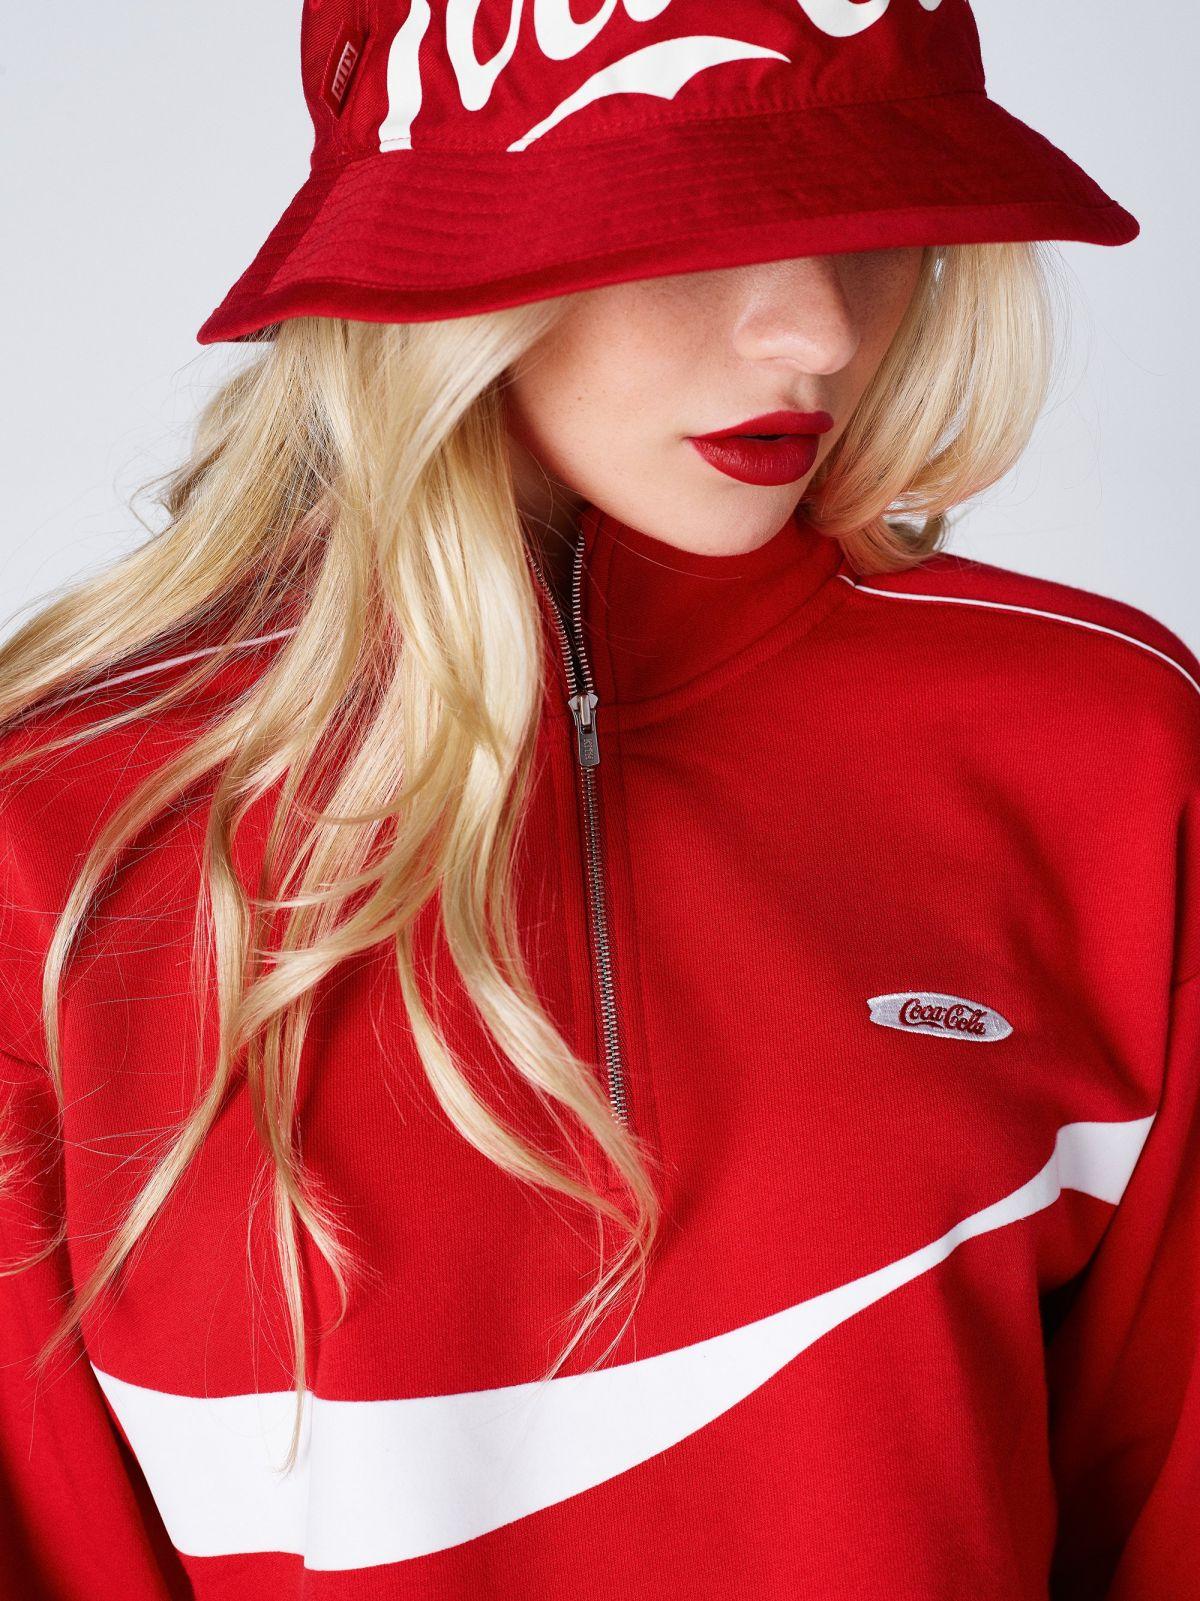 Josie Canseco 2019 : Josie Canseco – Kith x Coca Cola 2019 photoshoot-10